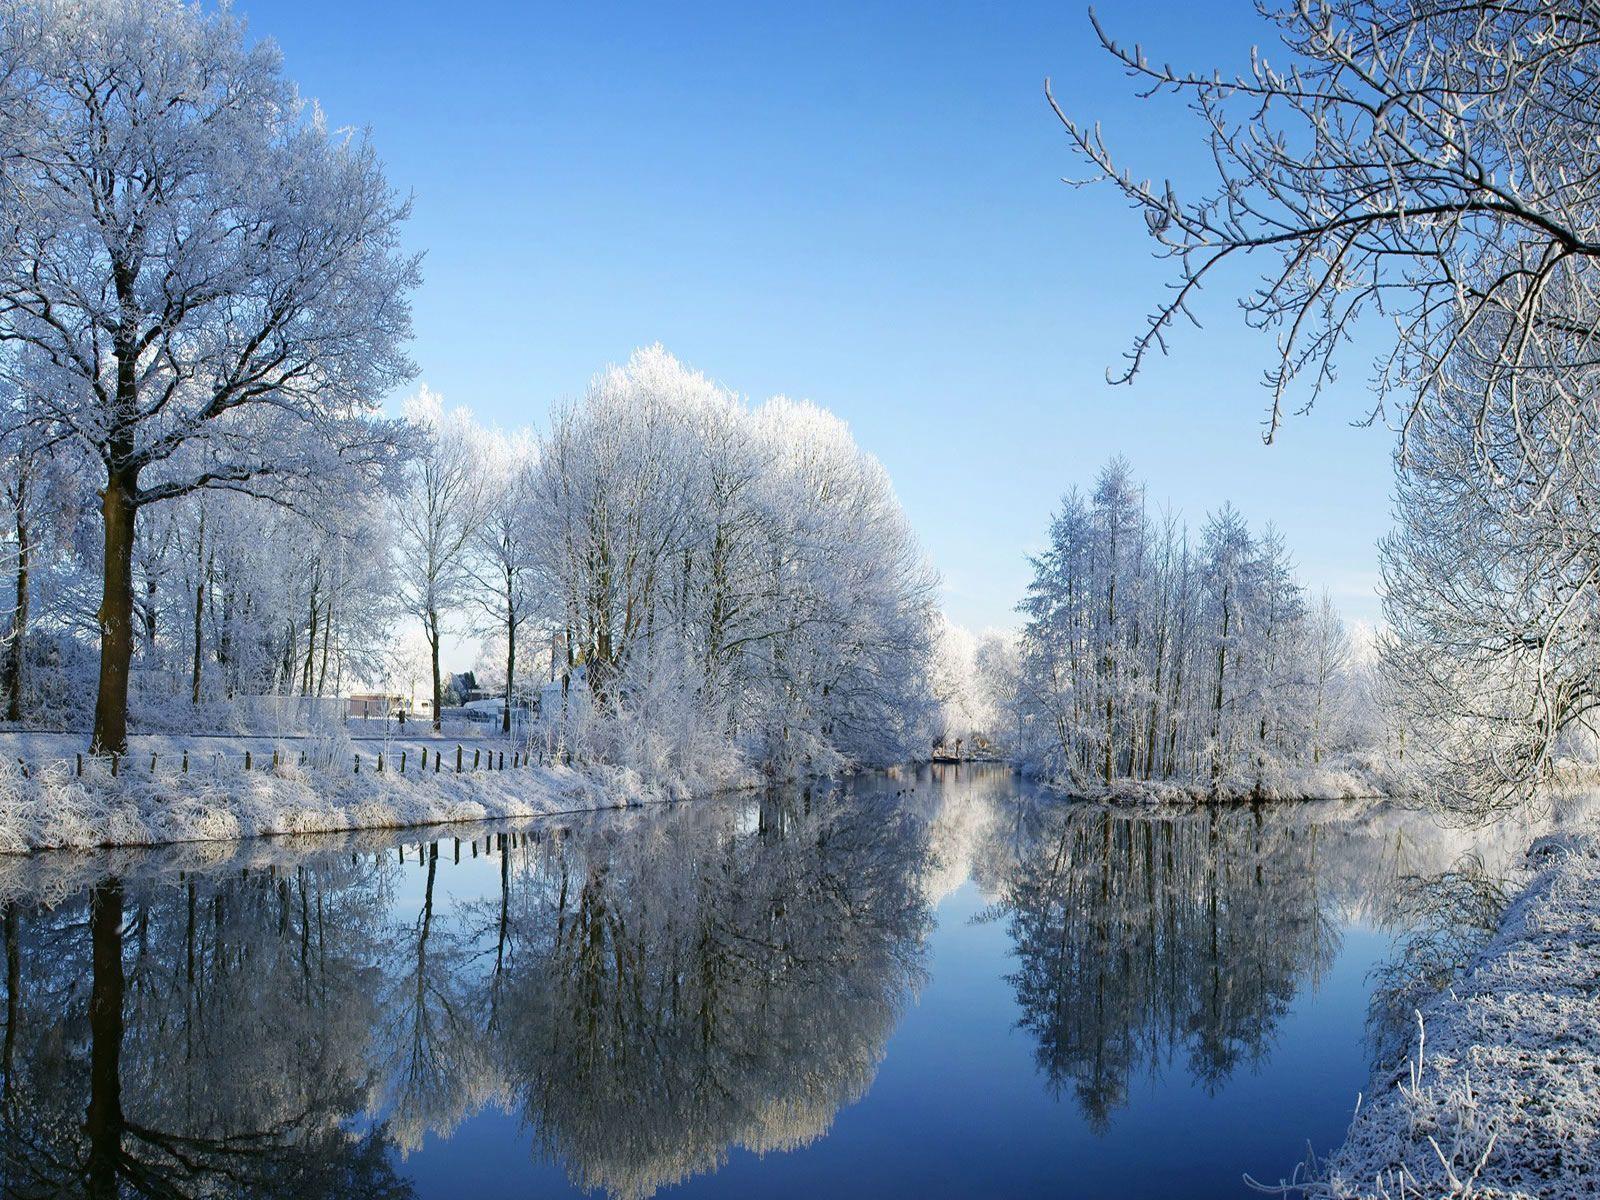 winter Wallpaper Backgrounds